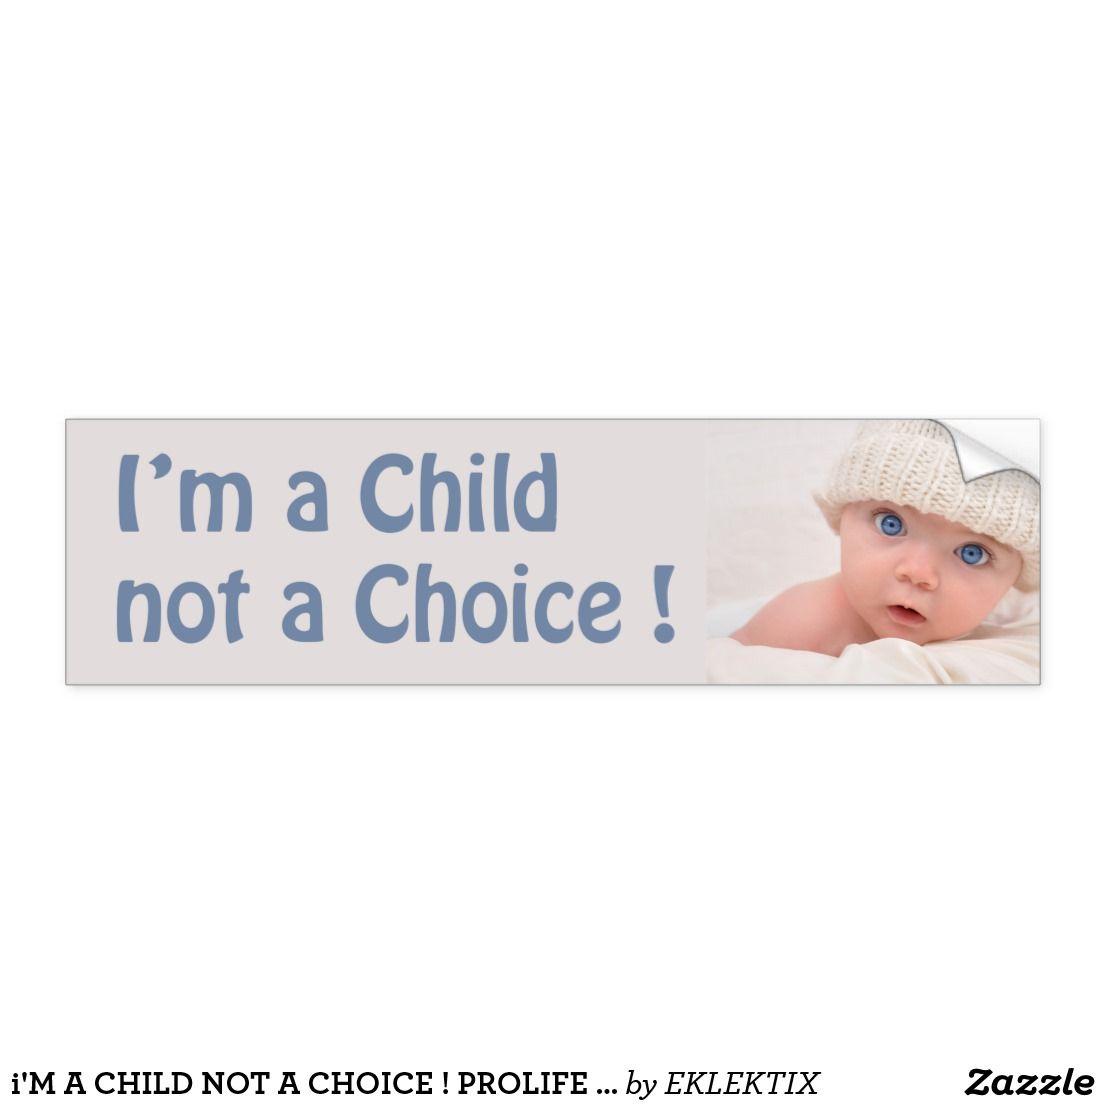 I M A Child Not A Choice Prolife Bumper Sticker Zazzle Com Bumper Stickers Pro Life Bumpers [ 1106 x 1106 Pixel ]